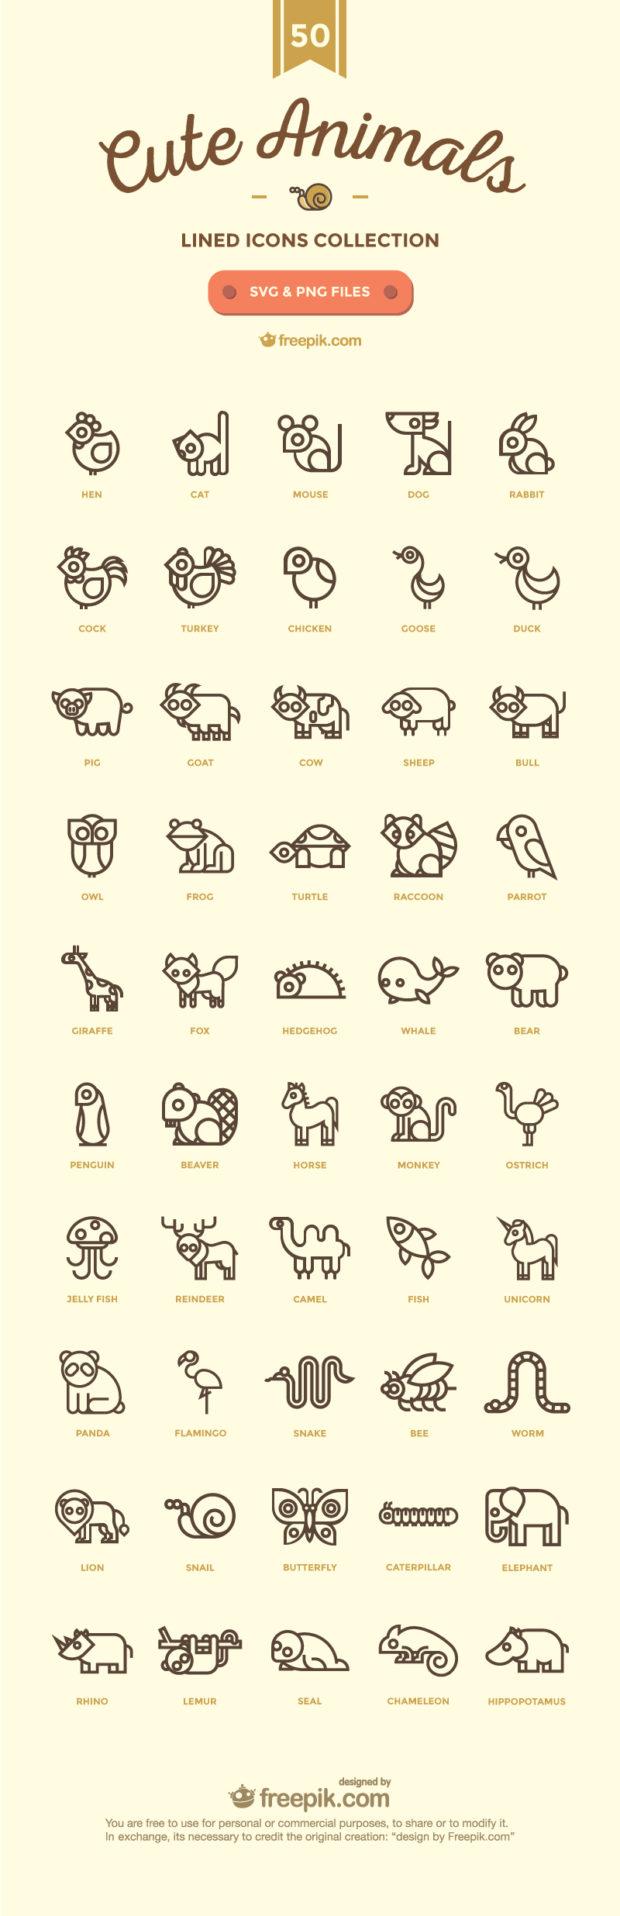 50-free-cute-linear-animals